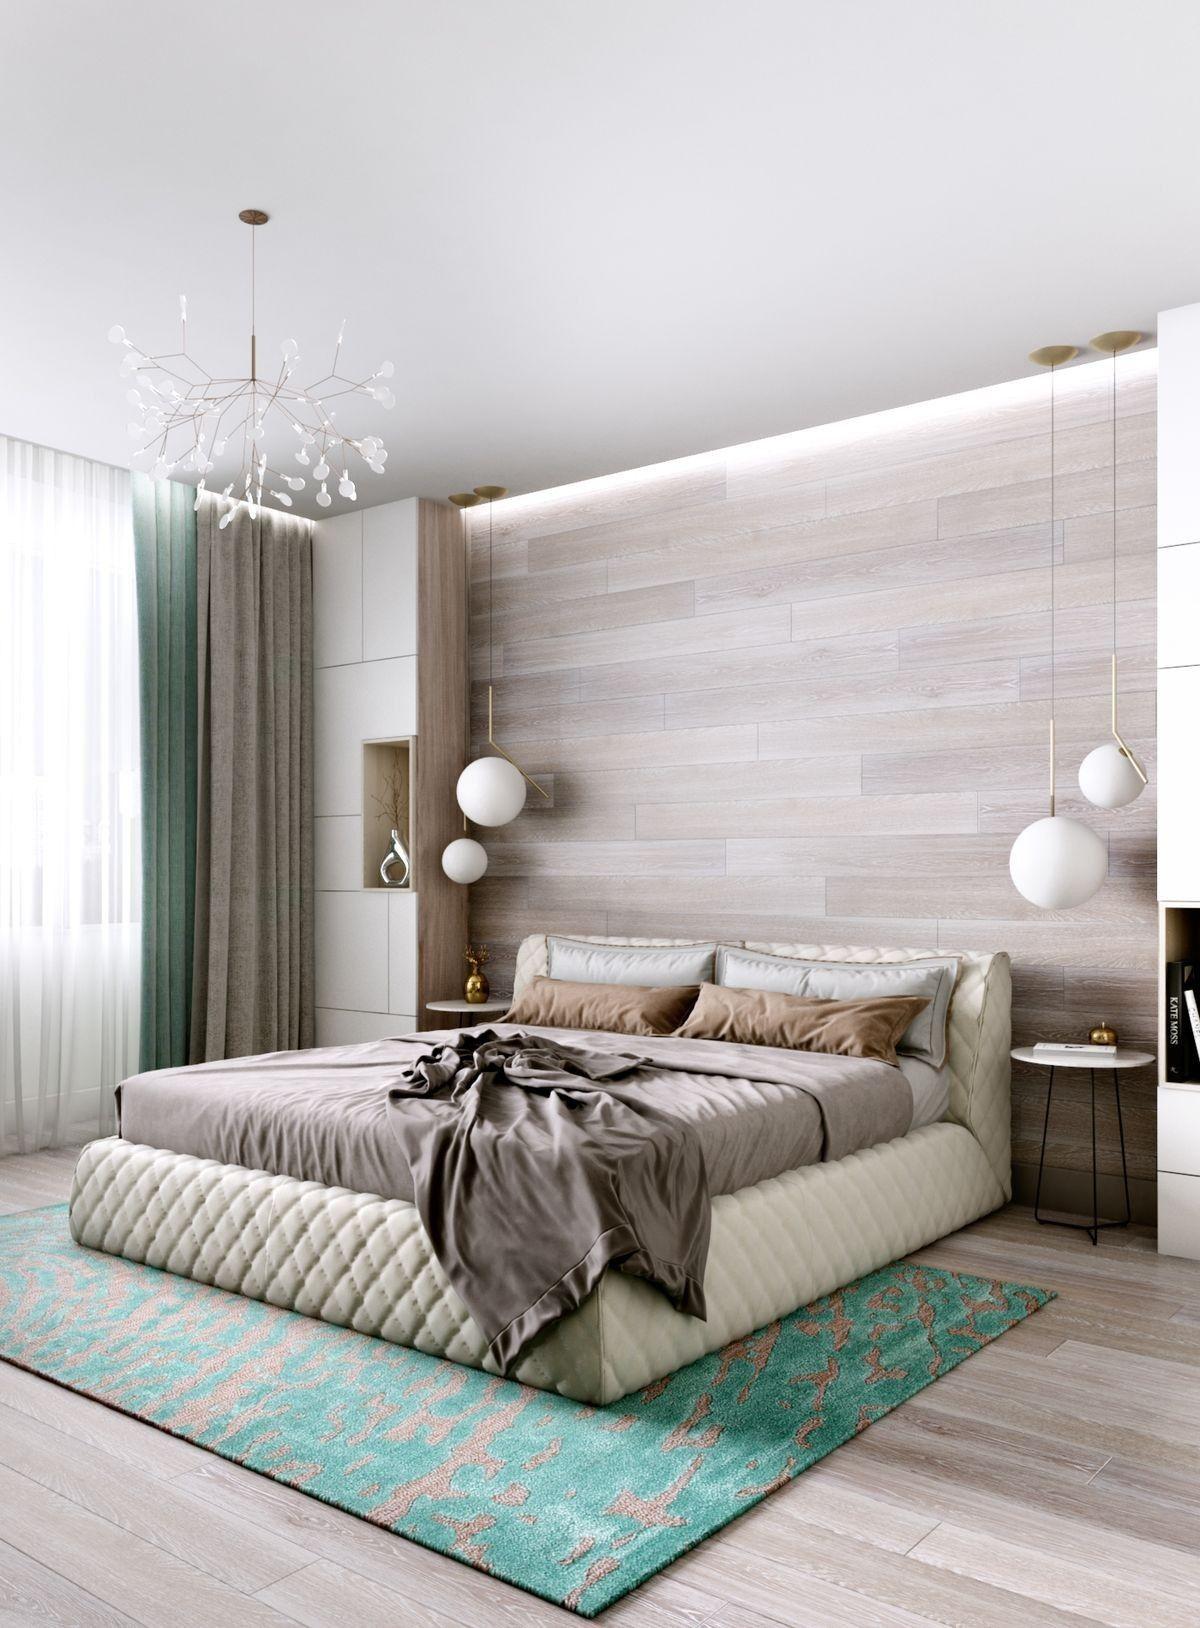 Pin by Florin Florin on Dormitoare | Pinterest | Bedrooms, Interiors ...